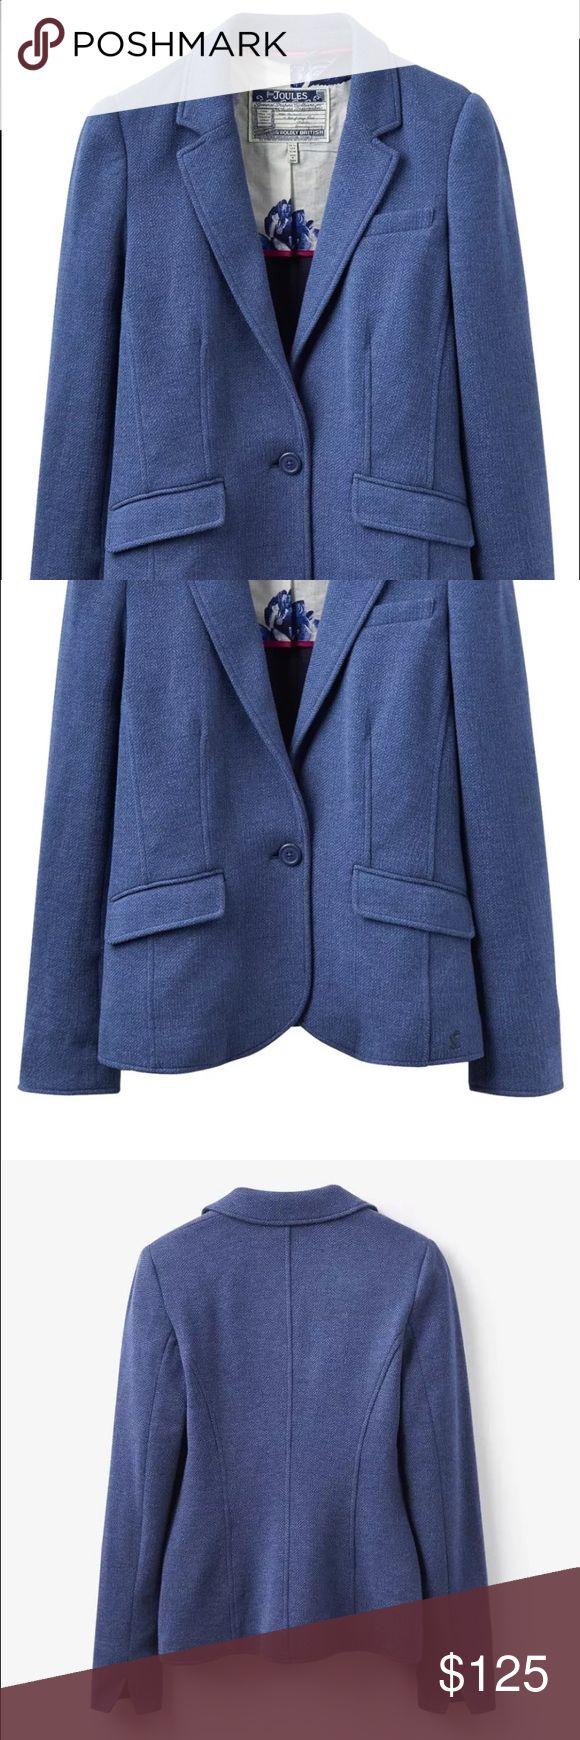 Selling this Joules Olivia Herringbone Blazer Chambray Size 4 on Poshmark! My username is: spenway. #shopmycloset #poshmark #fashion #shopping #style #forsale #Joules #Jackets & Blazers